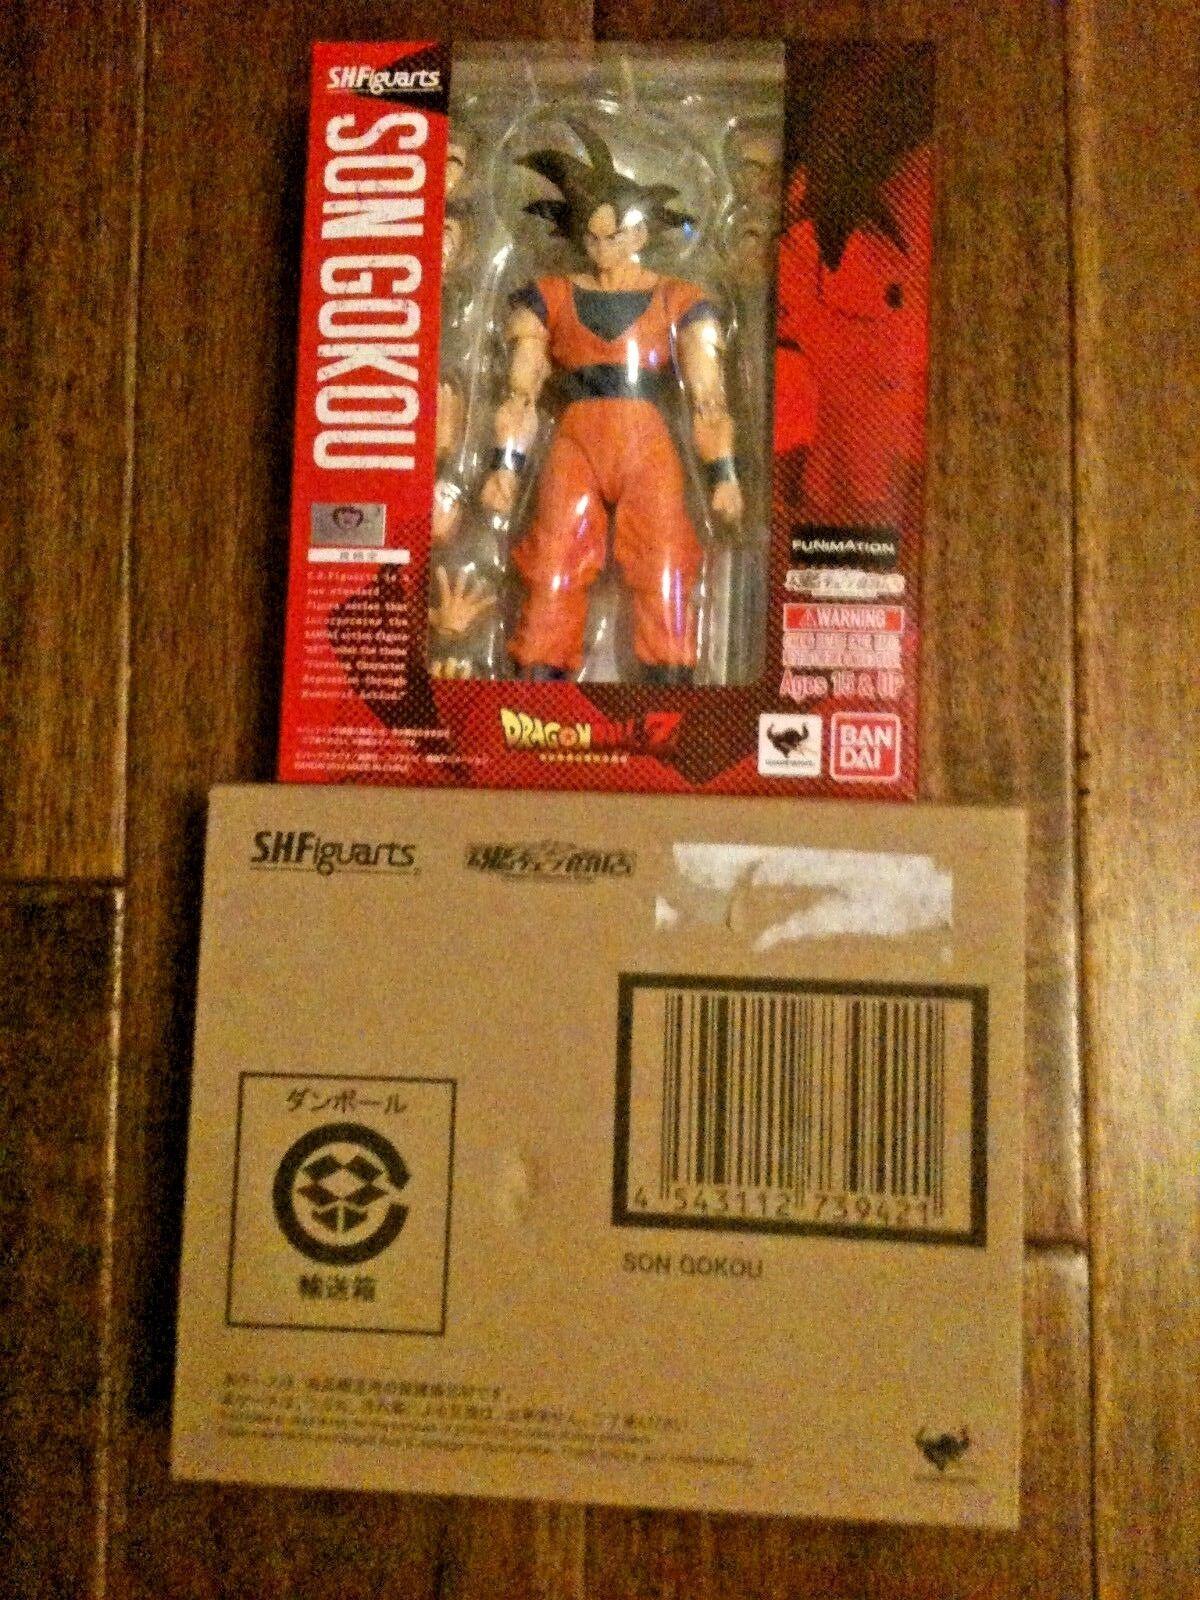 Baindai S.H. Figuarts Son Gokou - Dragon Ball Z Goku Figure with Shipping Box